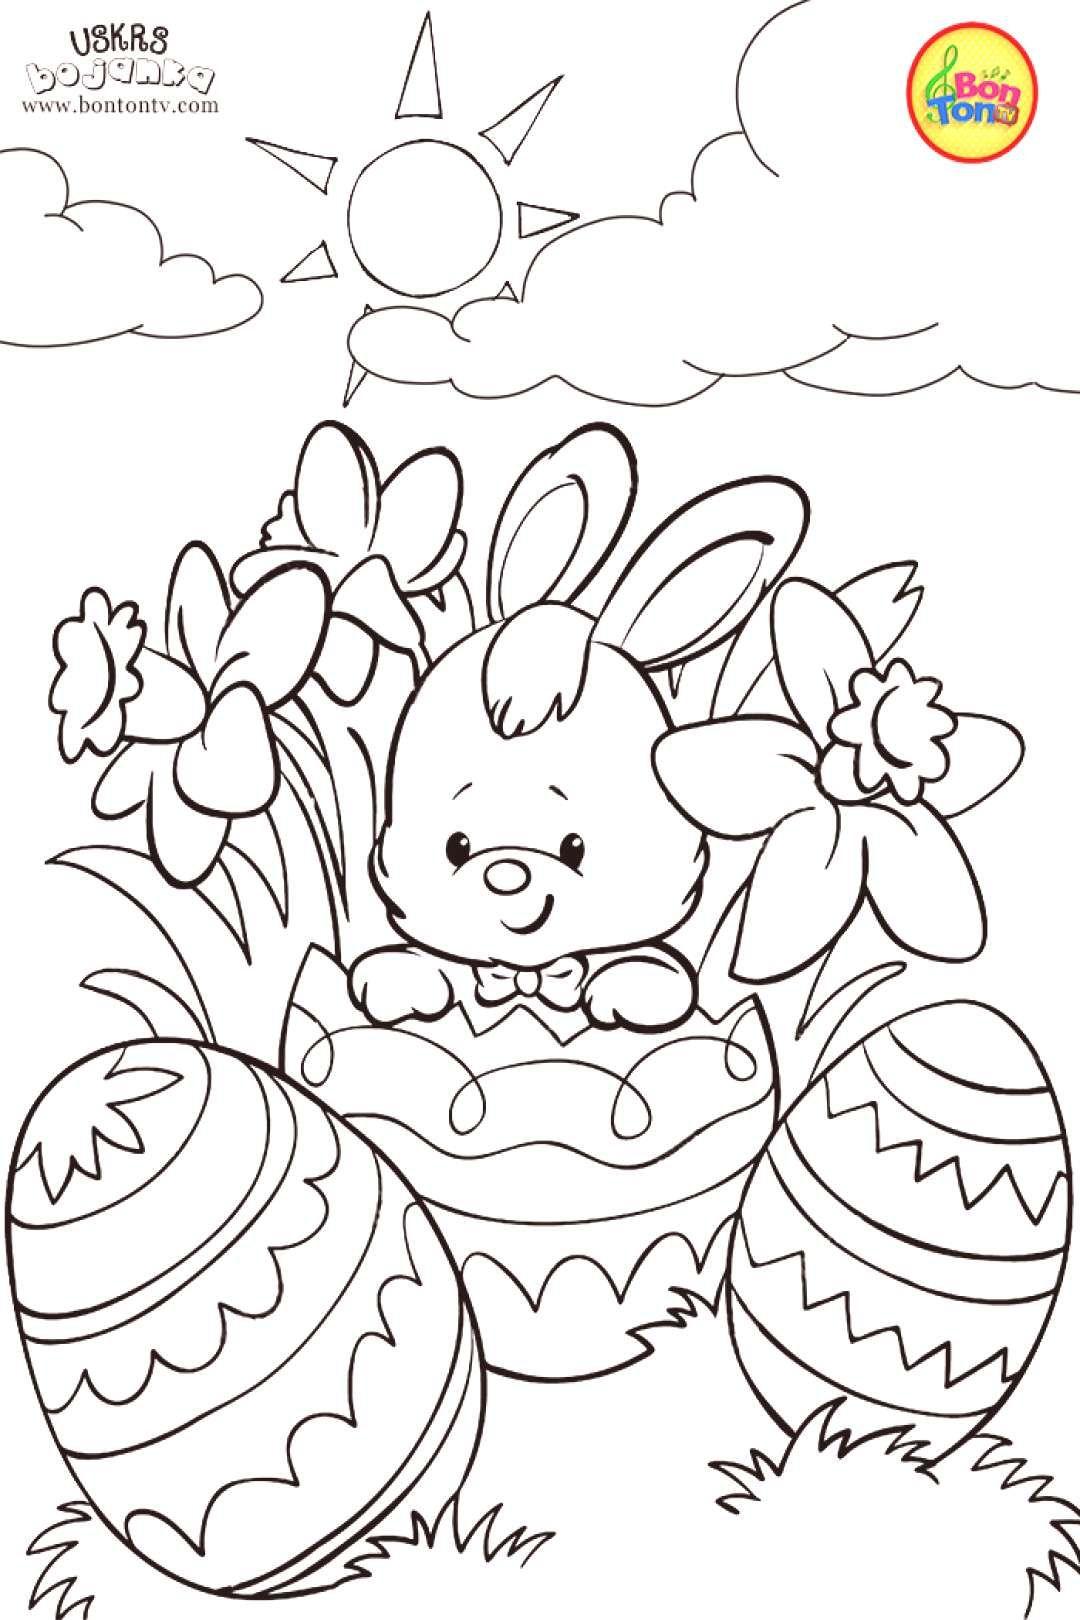 Coloringbooks Coloringpages Printables Coloring Bojanke Easter Bonton Chicks Djec Easter Coloring Sheets Easter Coloring Pictures Easter Coloring Book